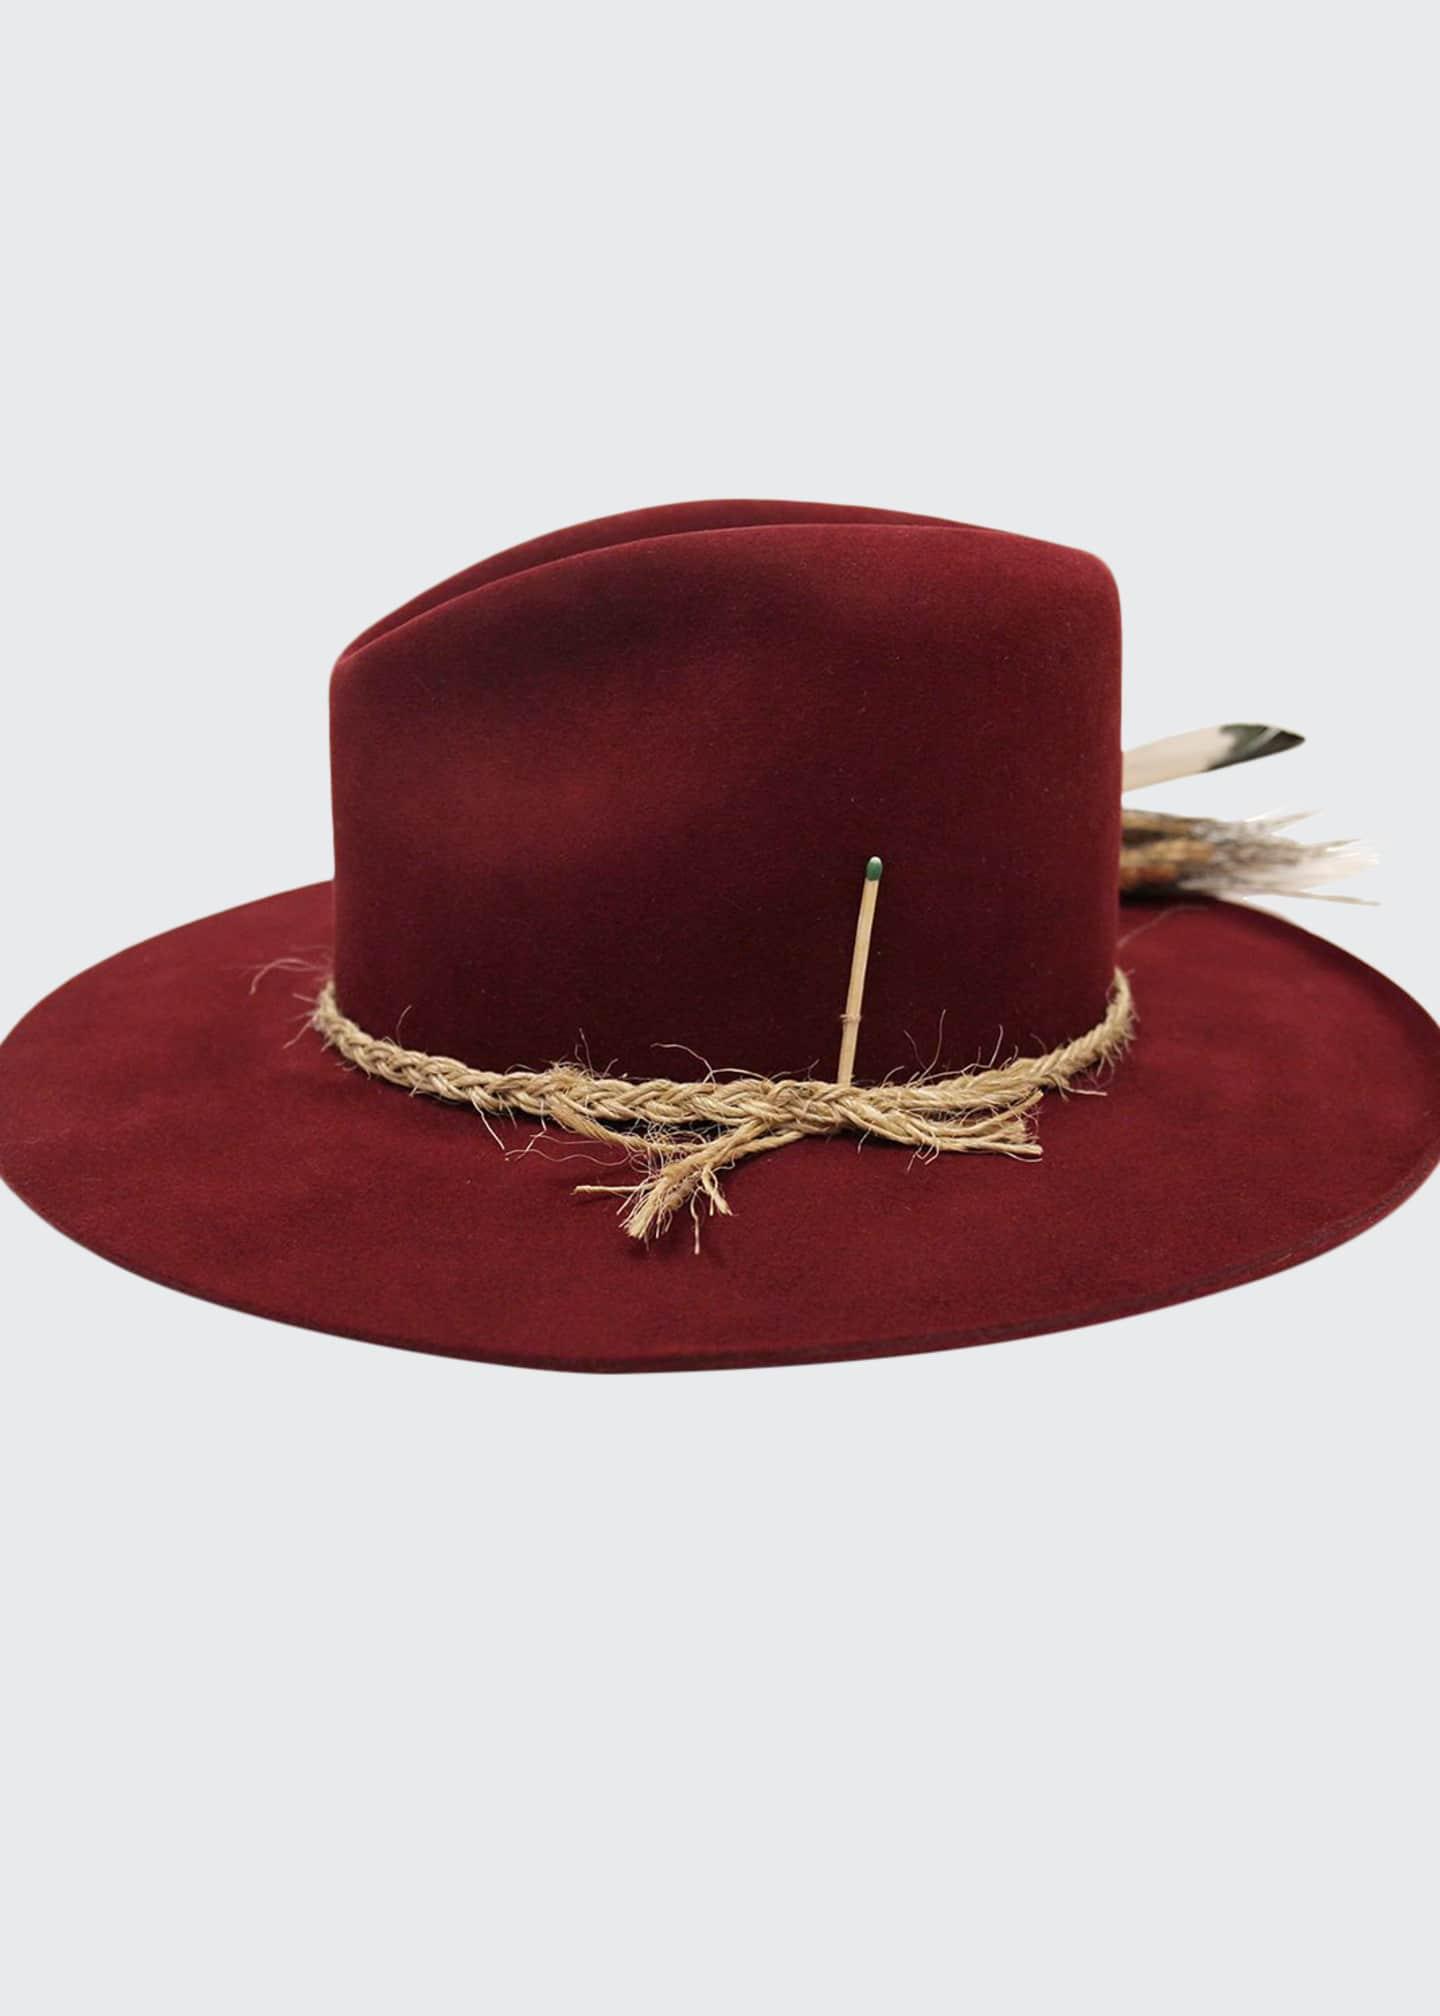 Nick Fouquet Scarlett Beaver Felt Fedora Hat w/